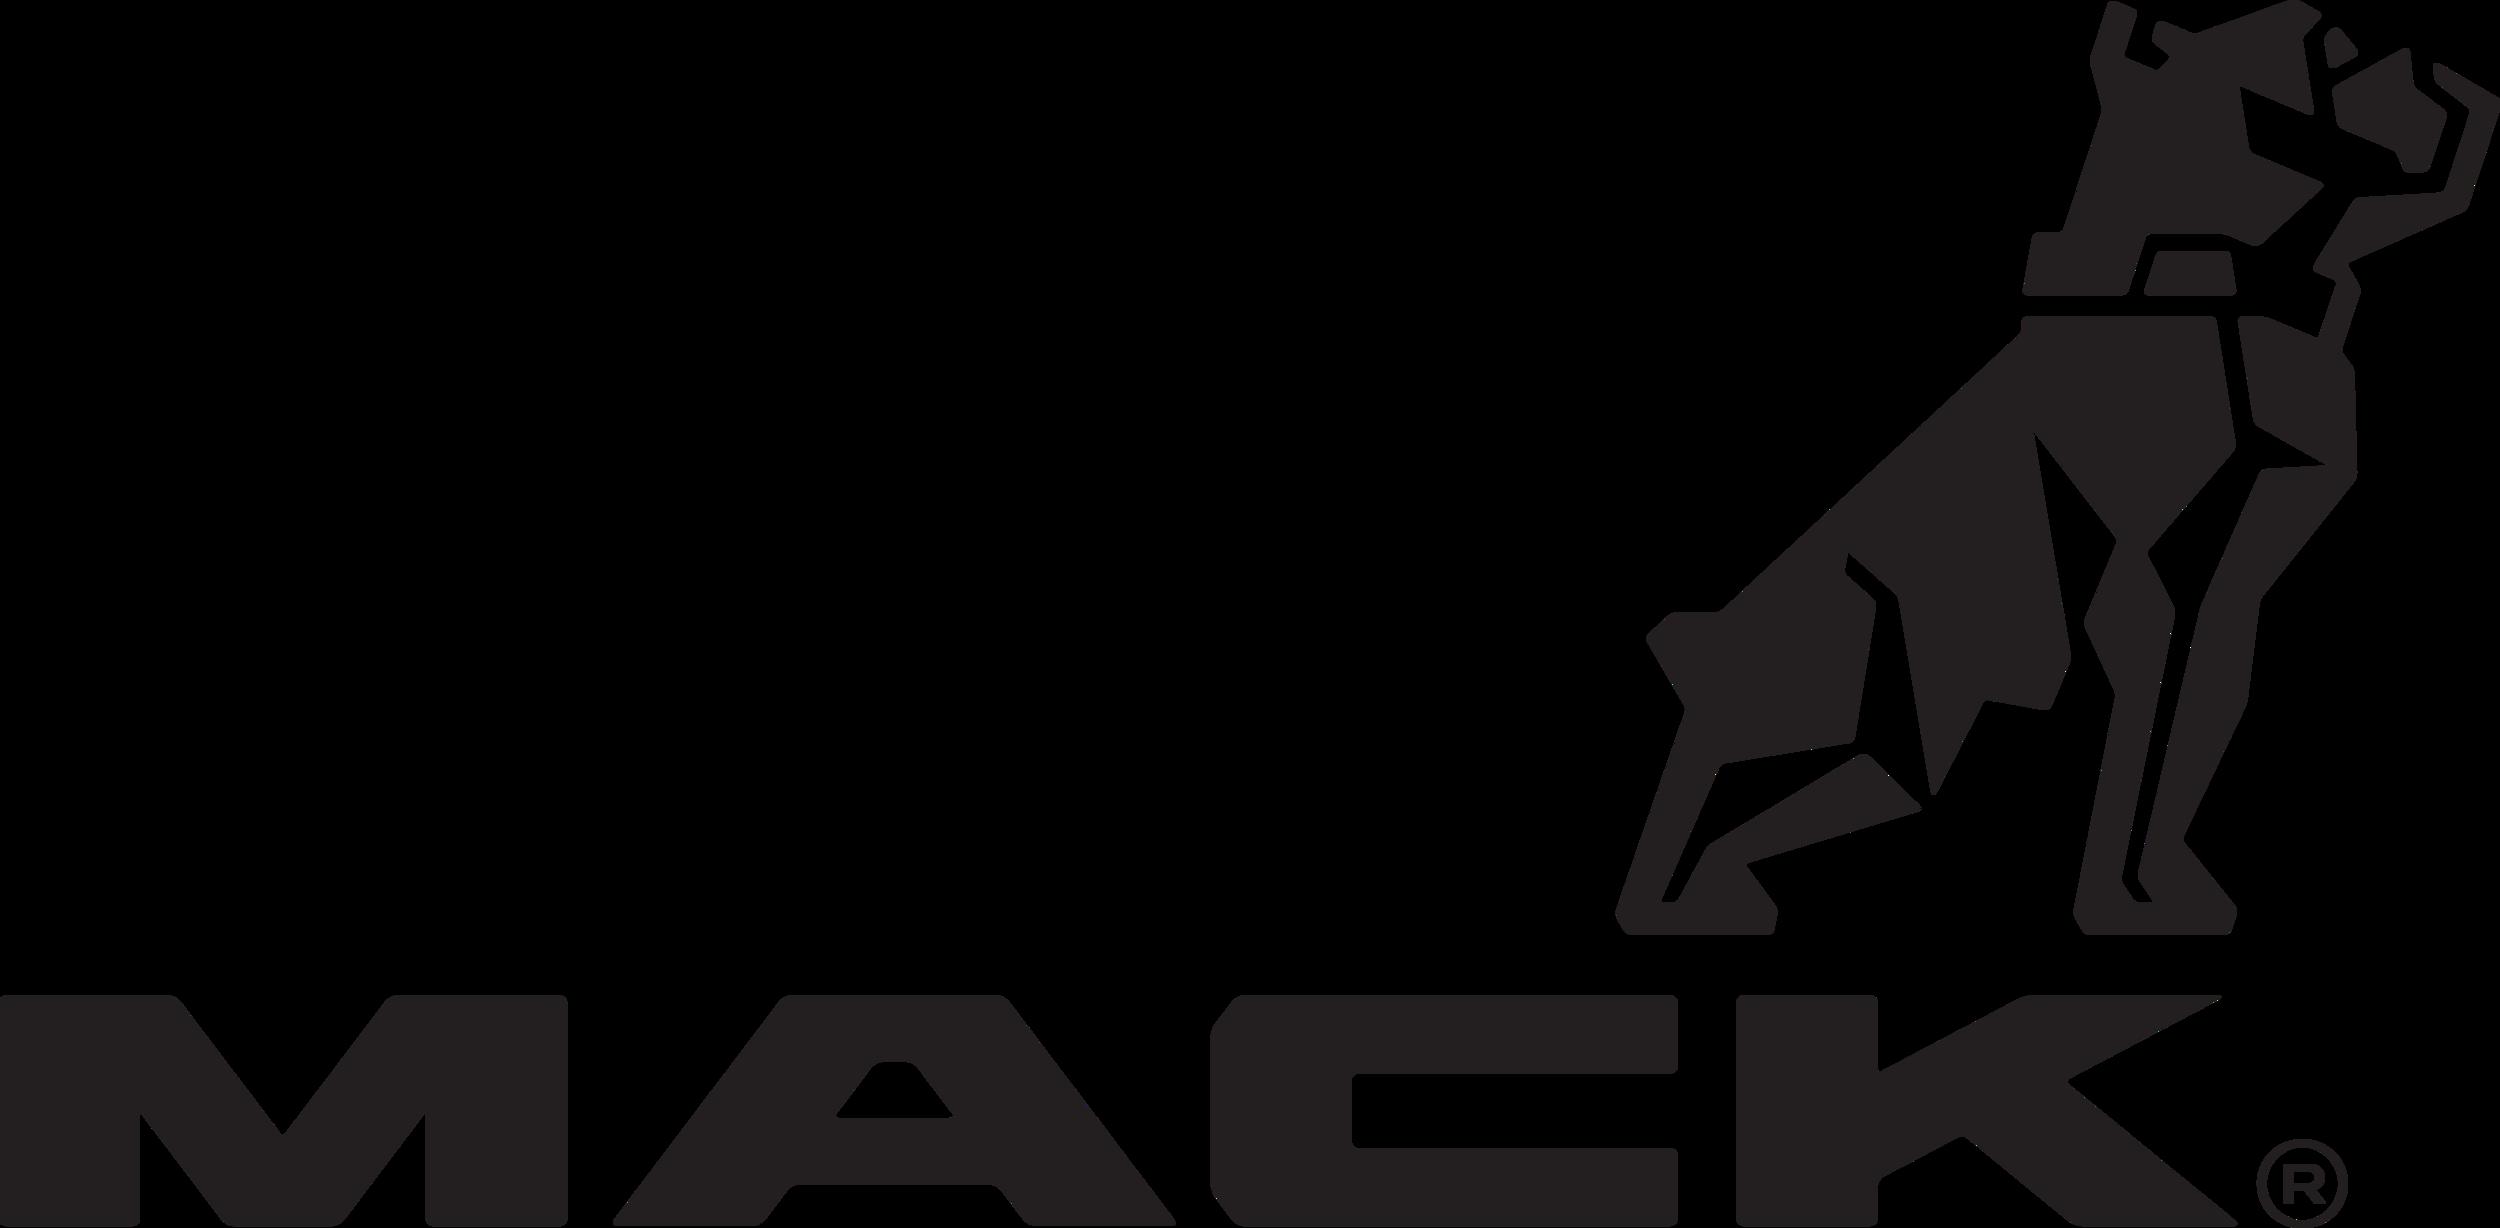 Mack_Trucks_logo.png